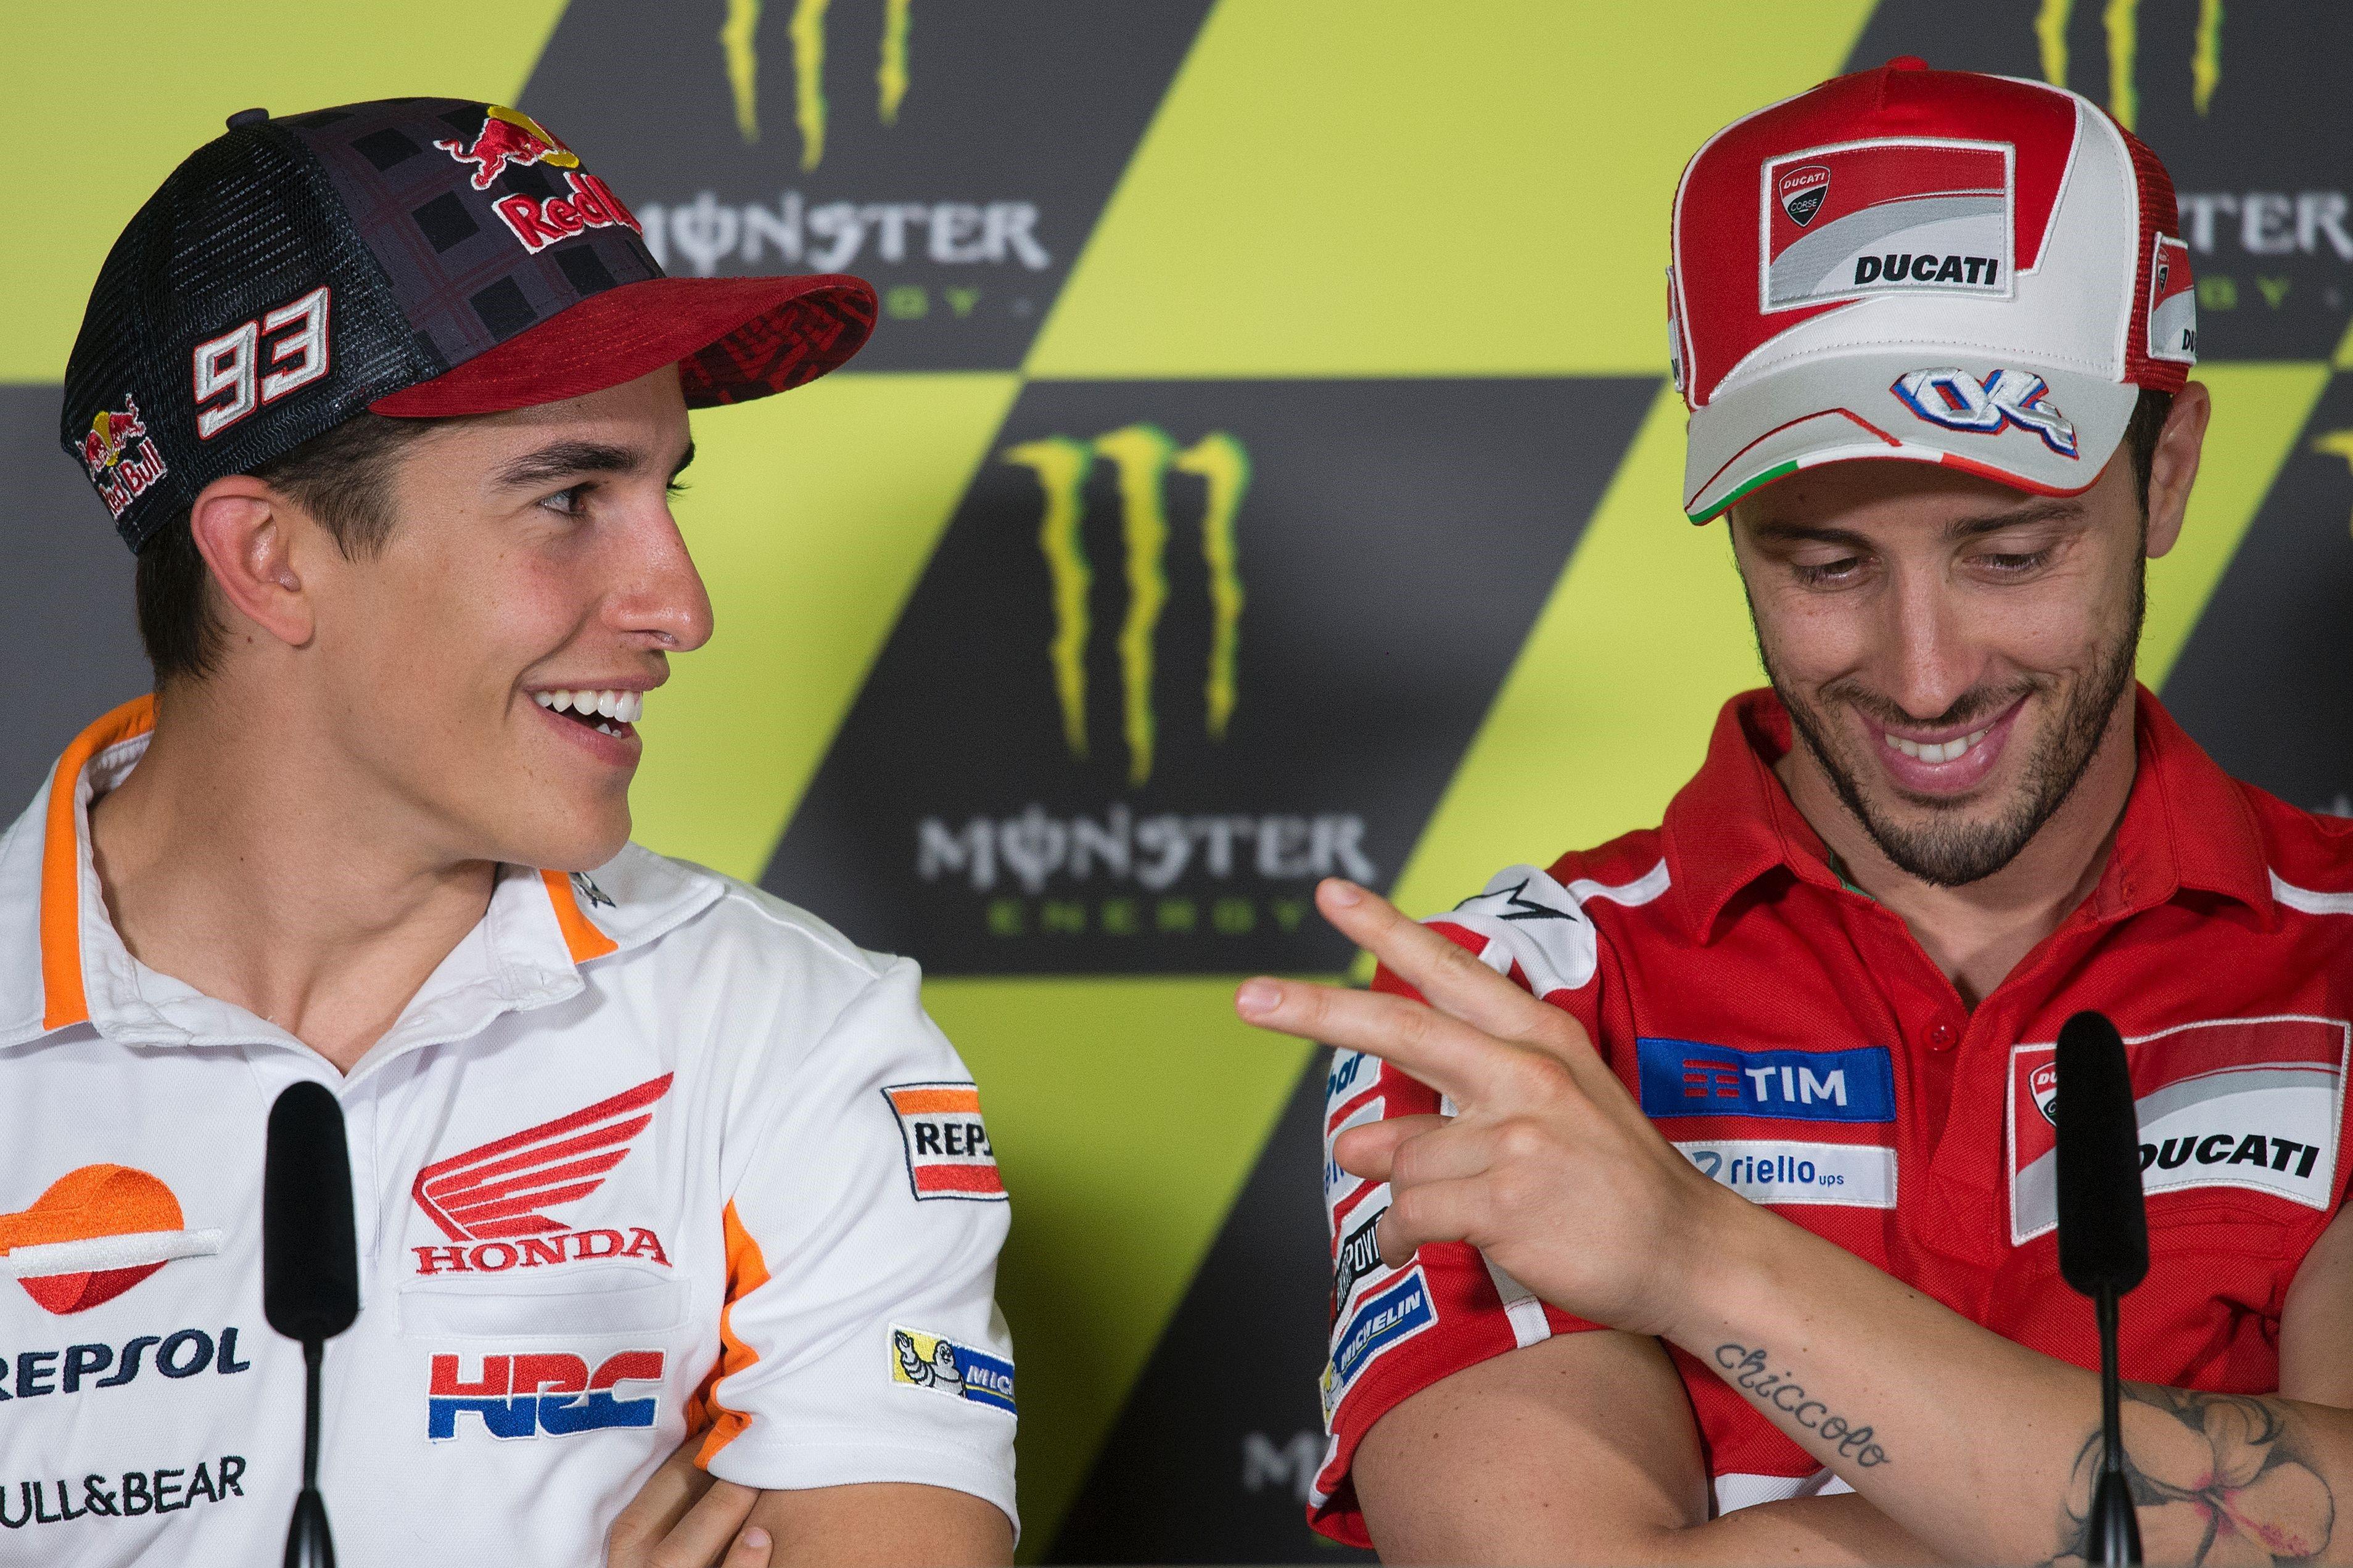 Marc Marquez (Honda HRC) et Andrea Dovizioso (Ducati Team) au Grand Prix de Catalogne 2017